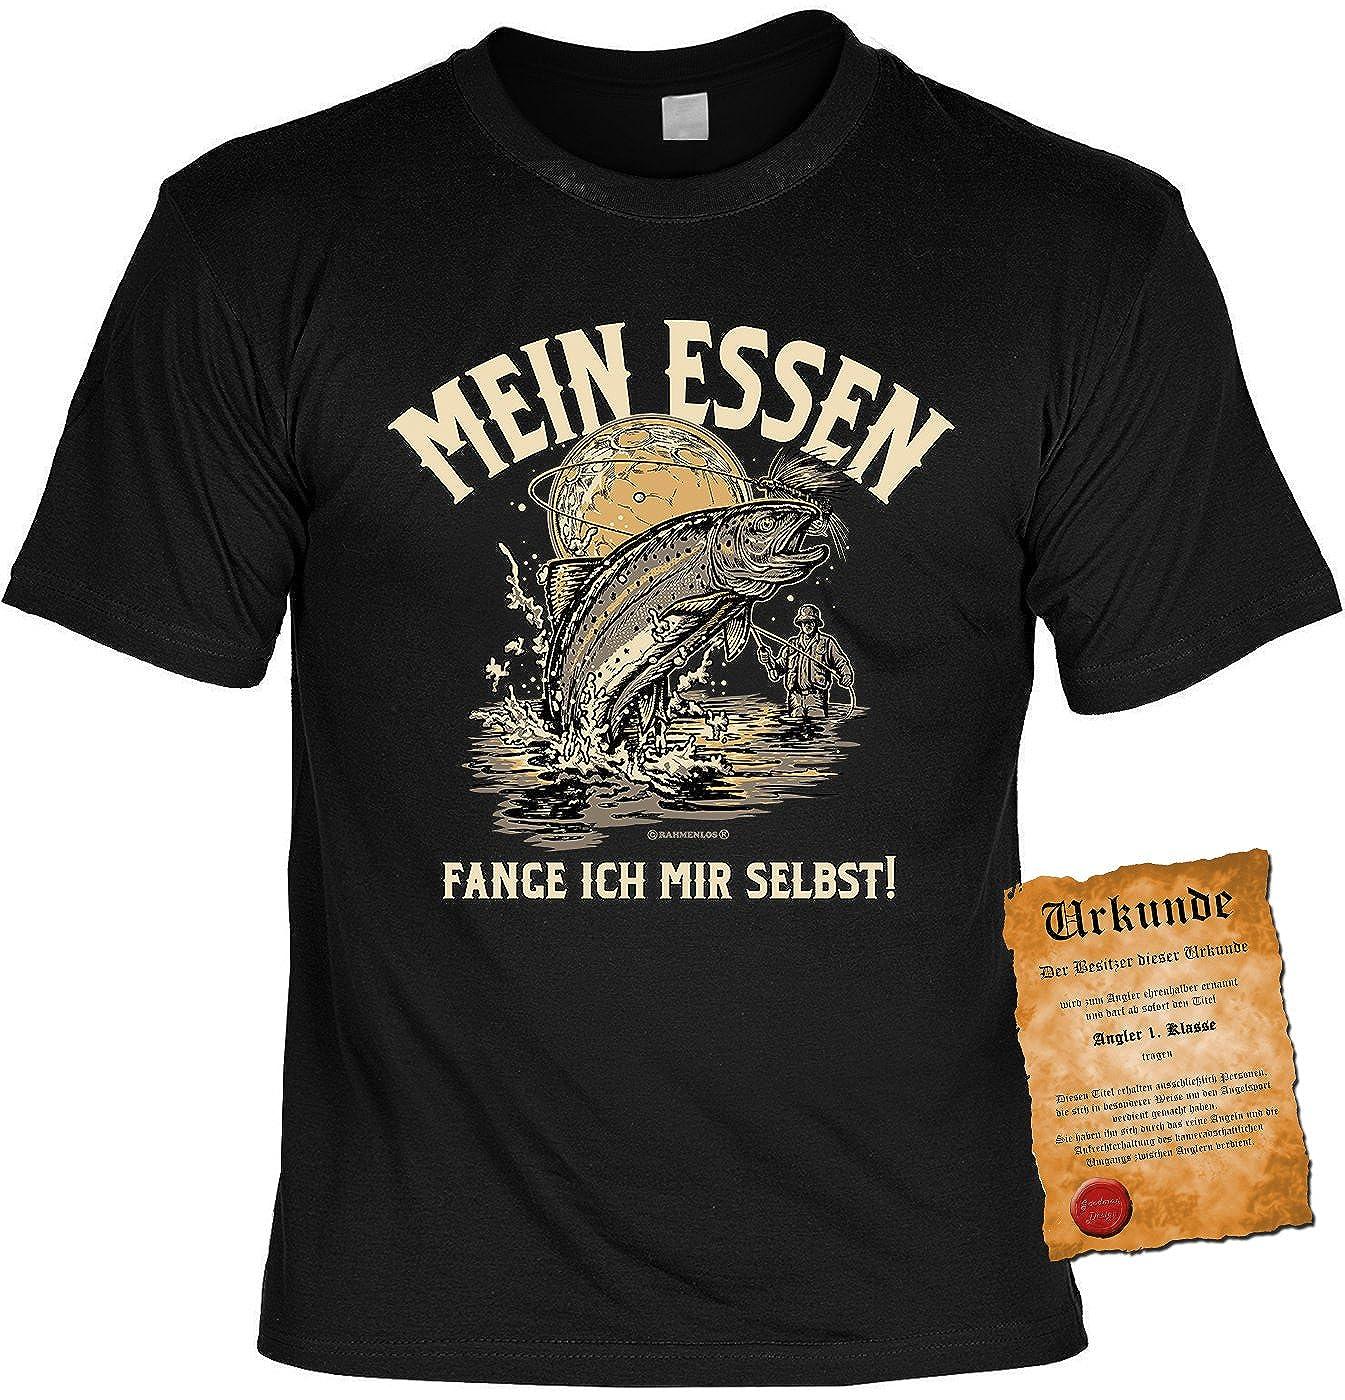 Bekleidung Angler Geschenk-Shirt Angler-Motiv : Mein Essen fange ich Mir selbst Angler Spr/üche T-Shirt Anglershirt Angelsport Hobby-Angeln